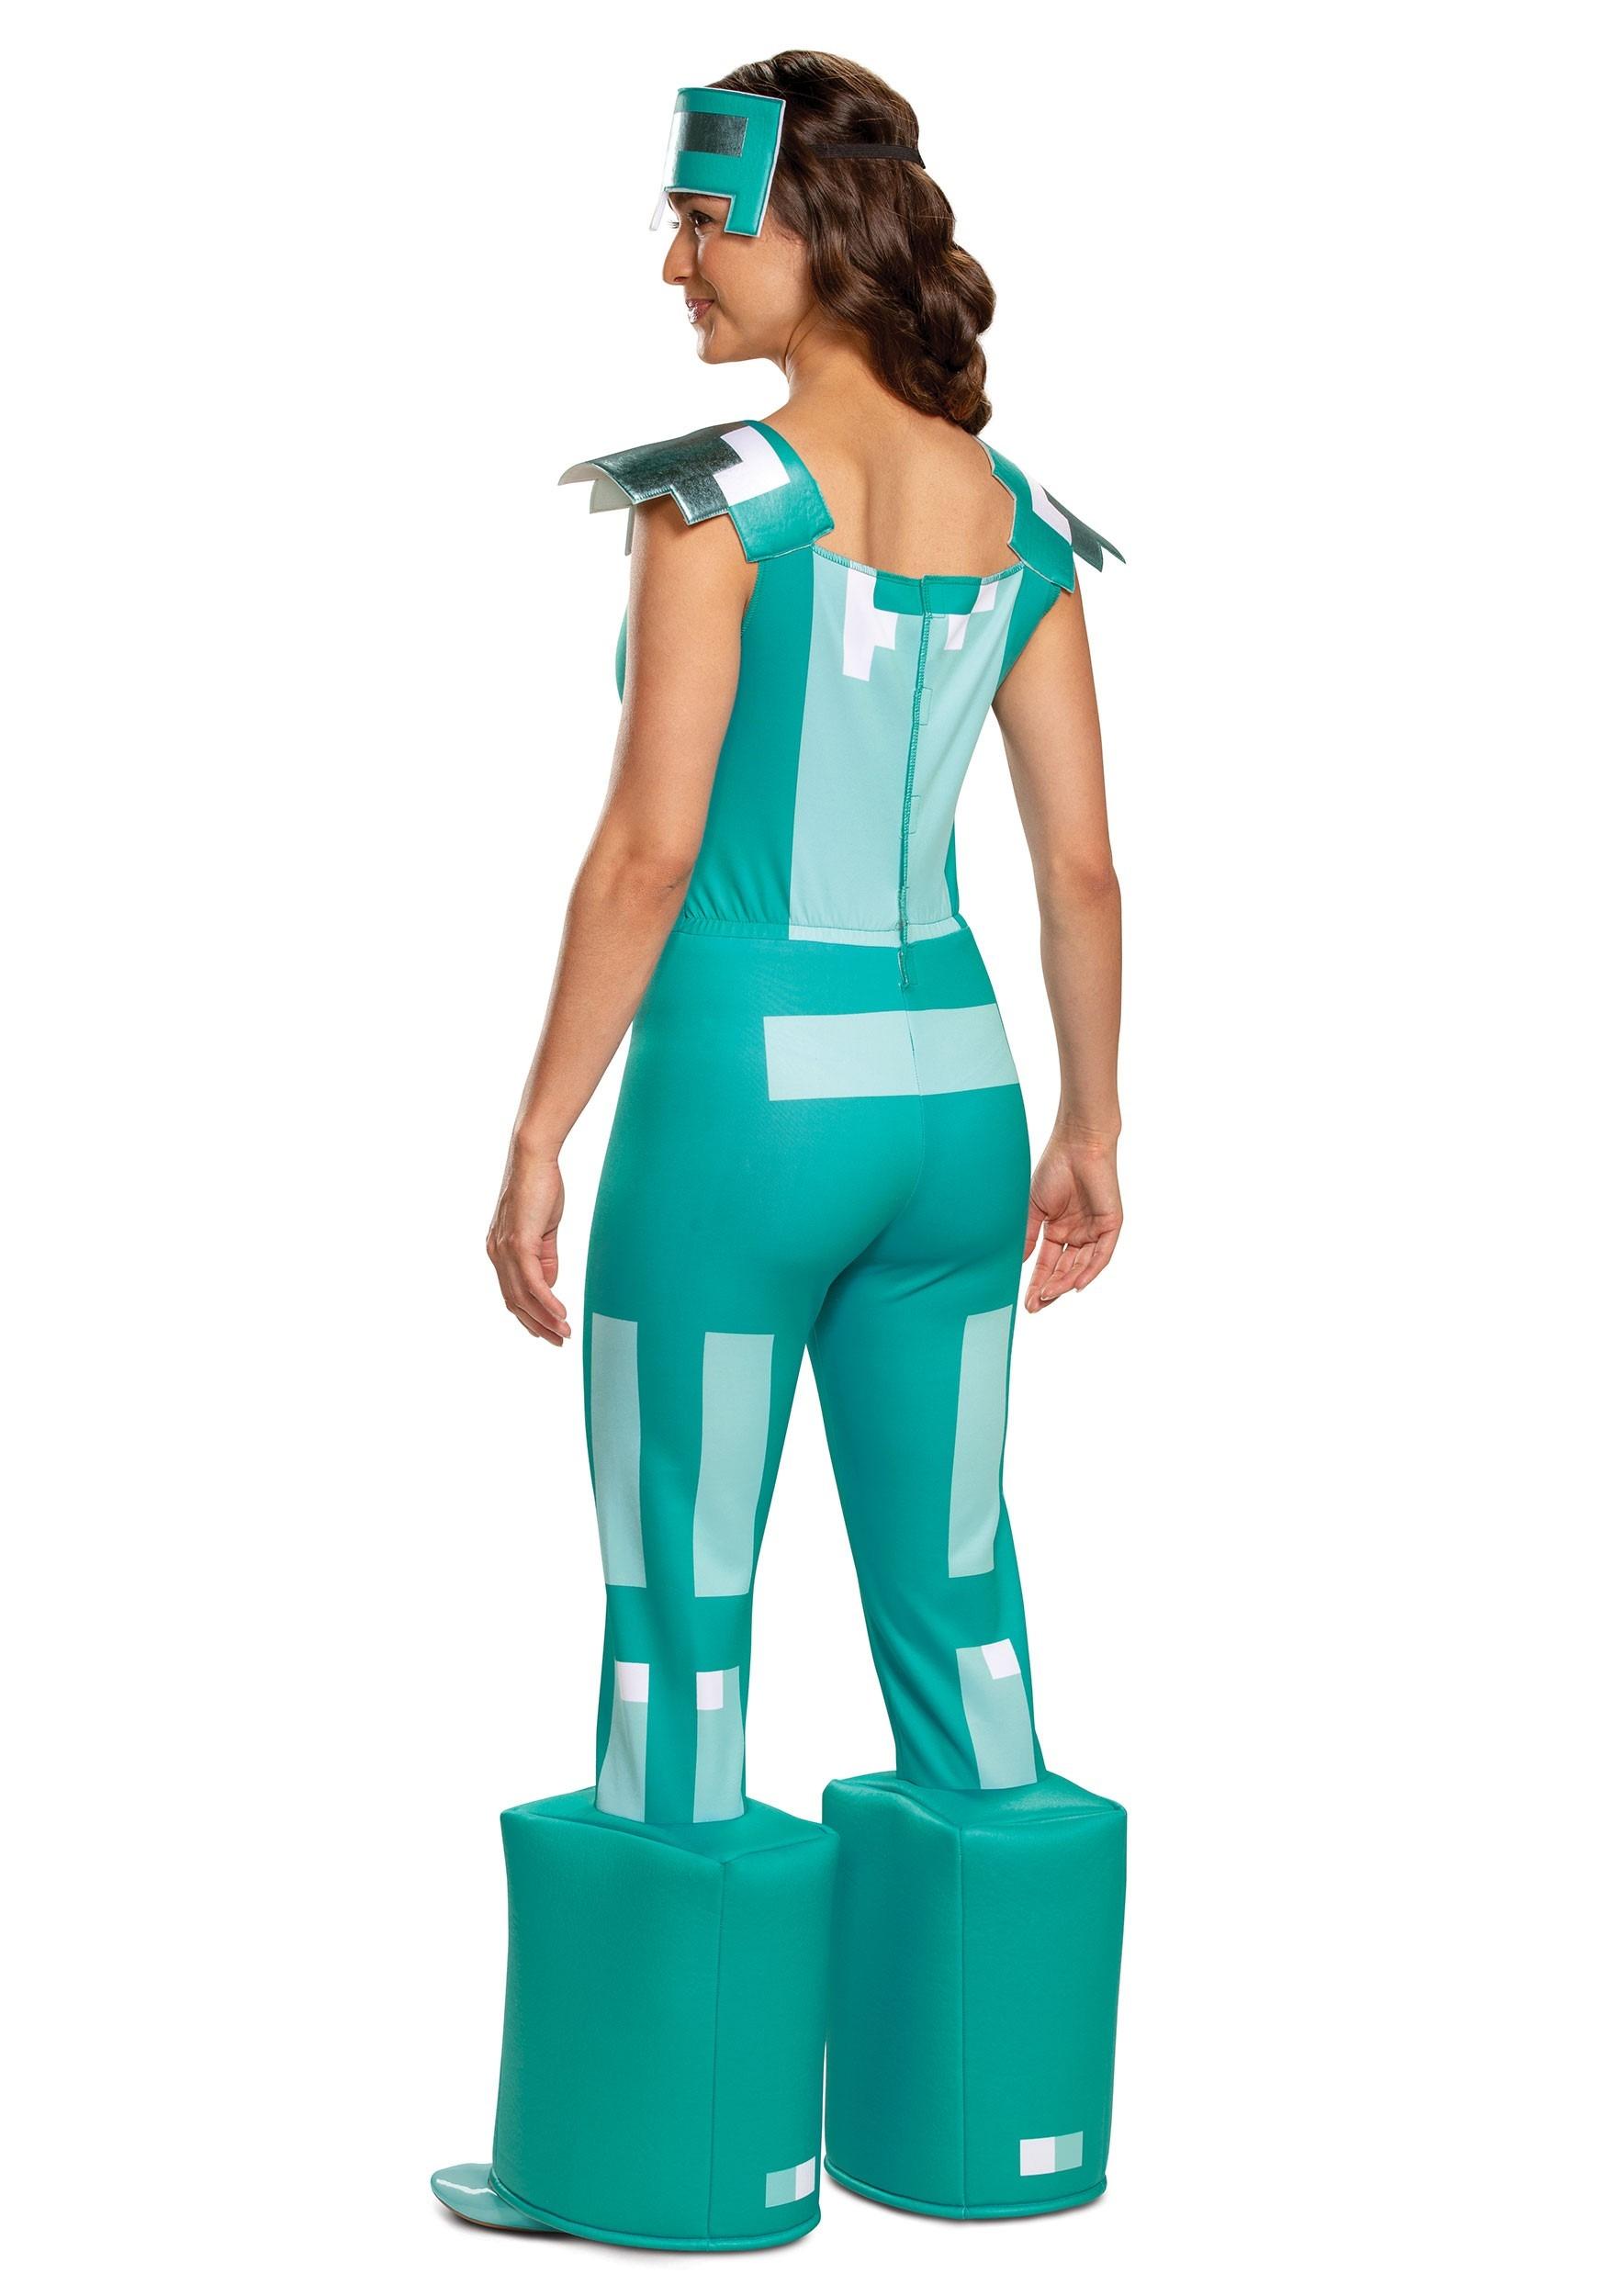 Minecraft Female Armor Costume